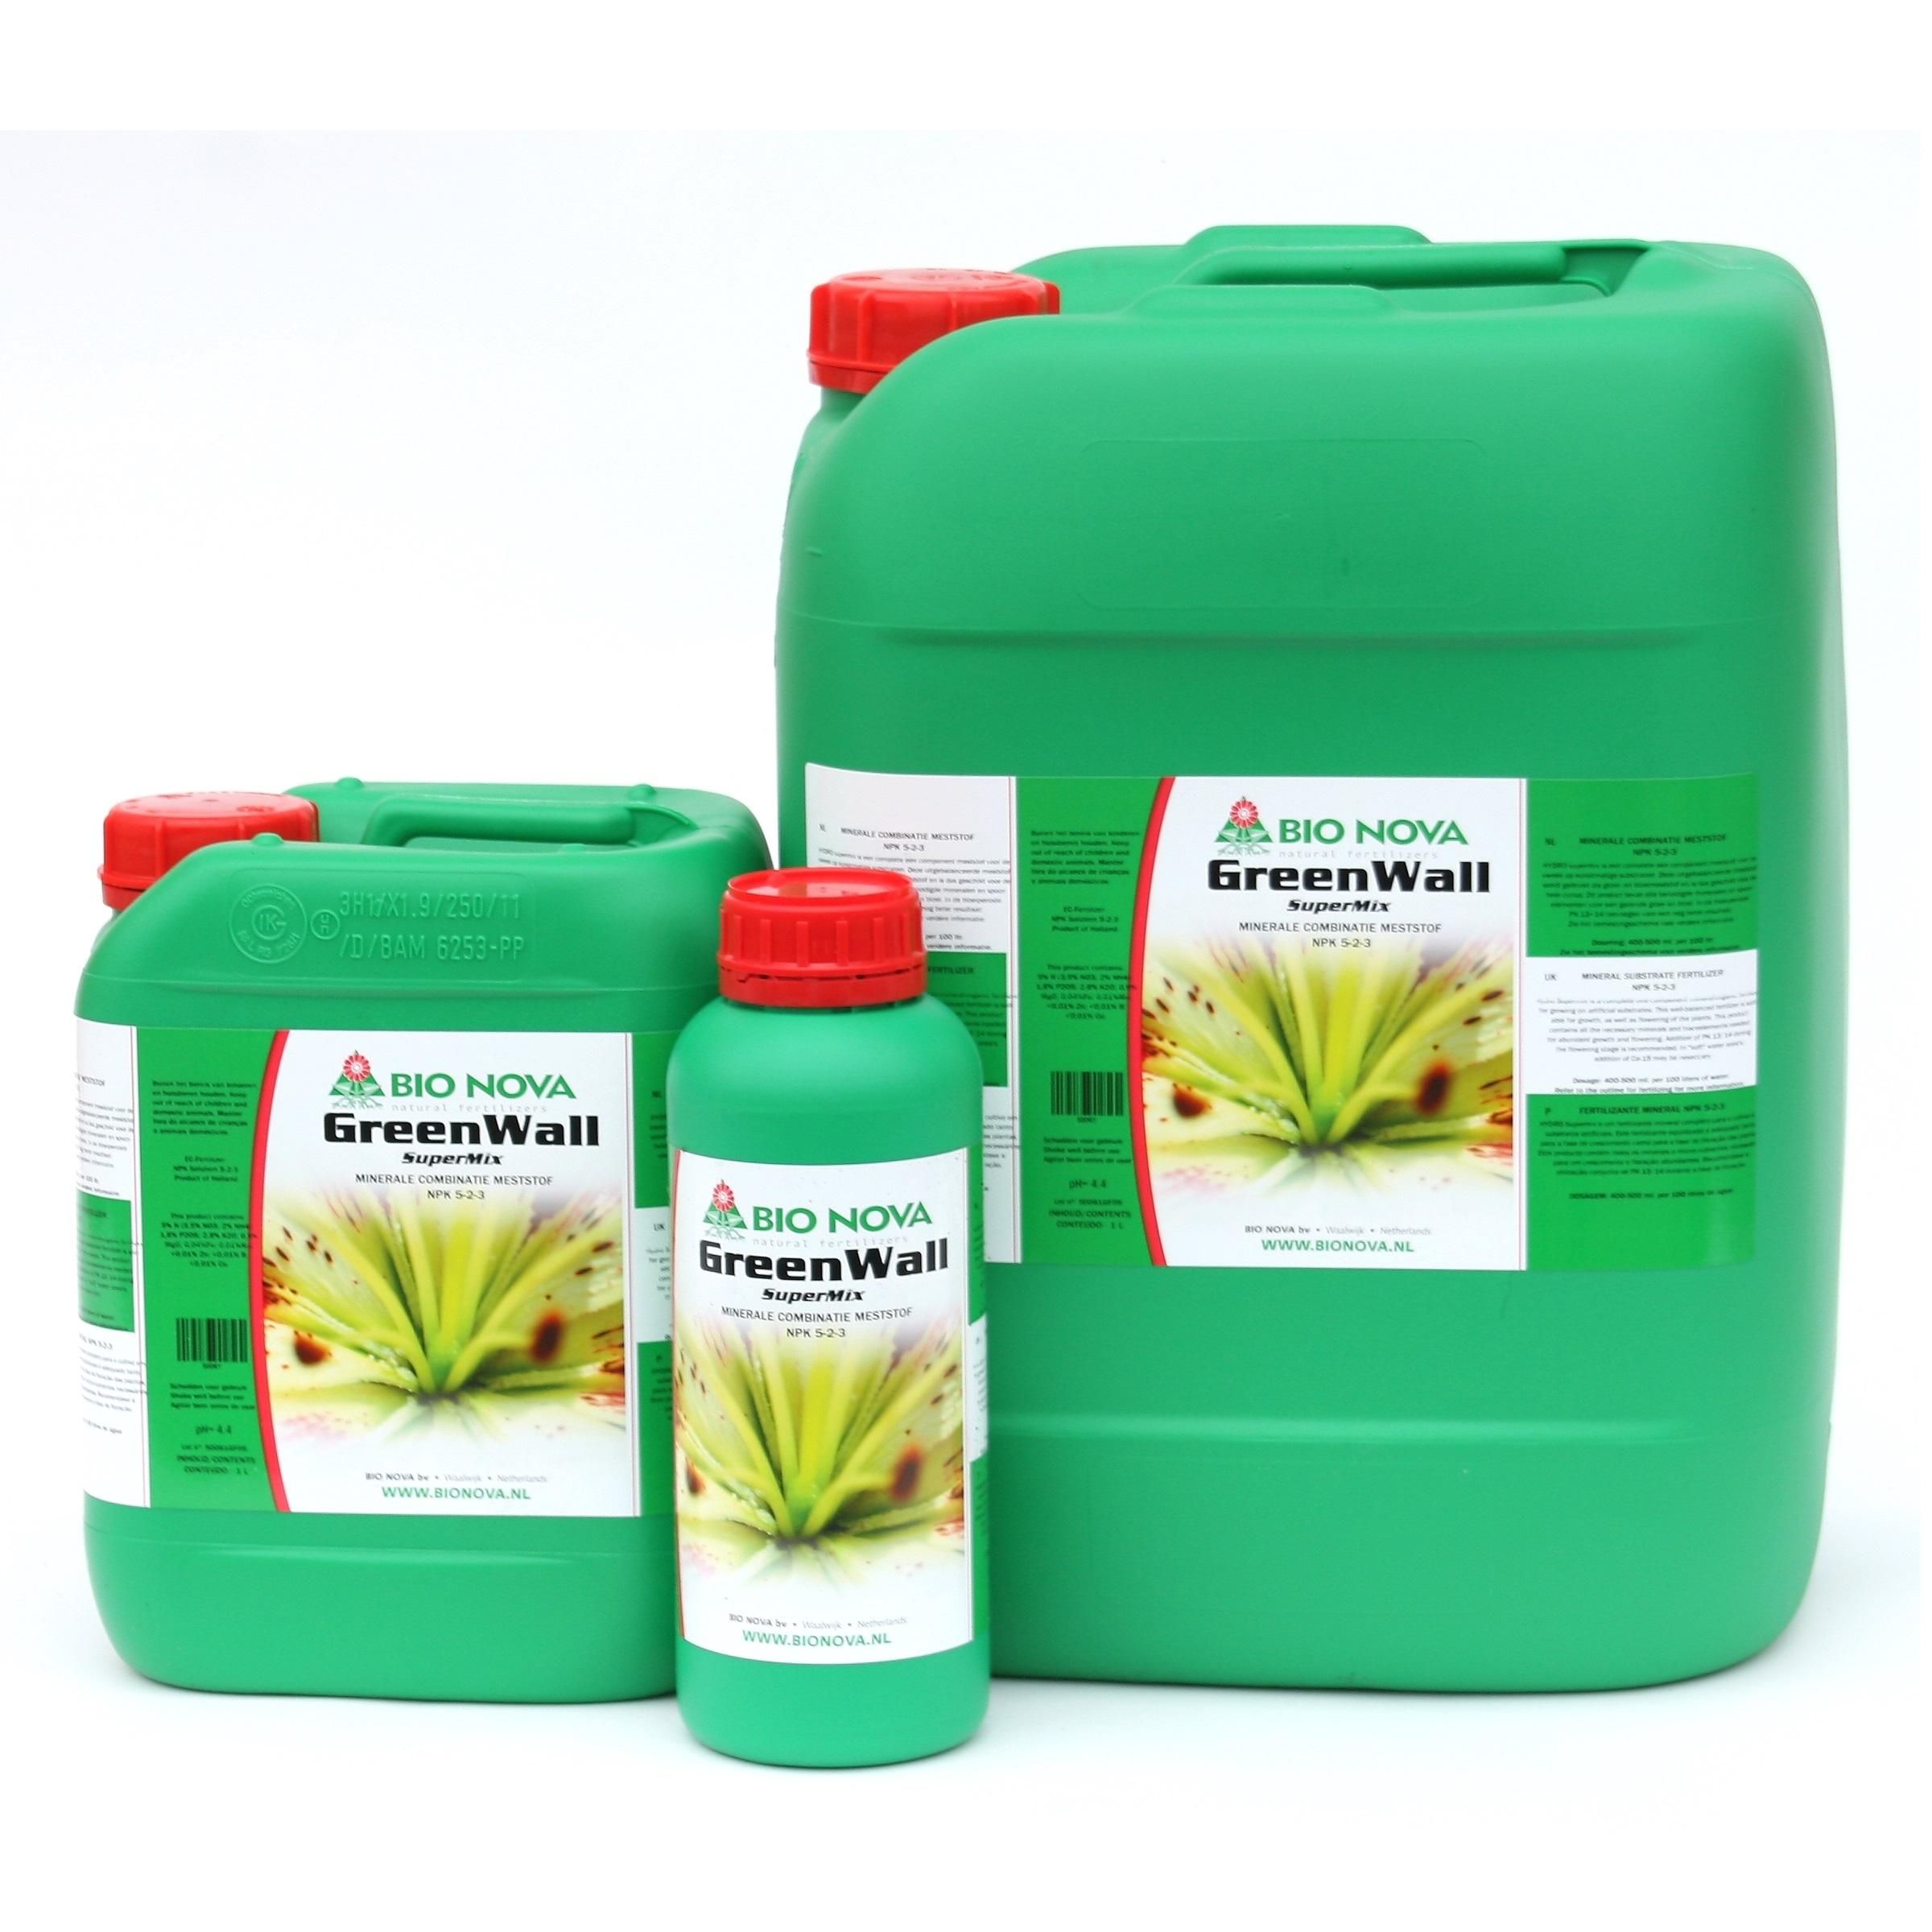 Bio Nova BN GreenWall SuperMix 20 Liter